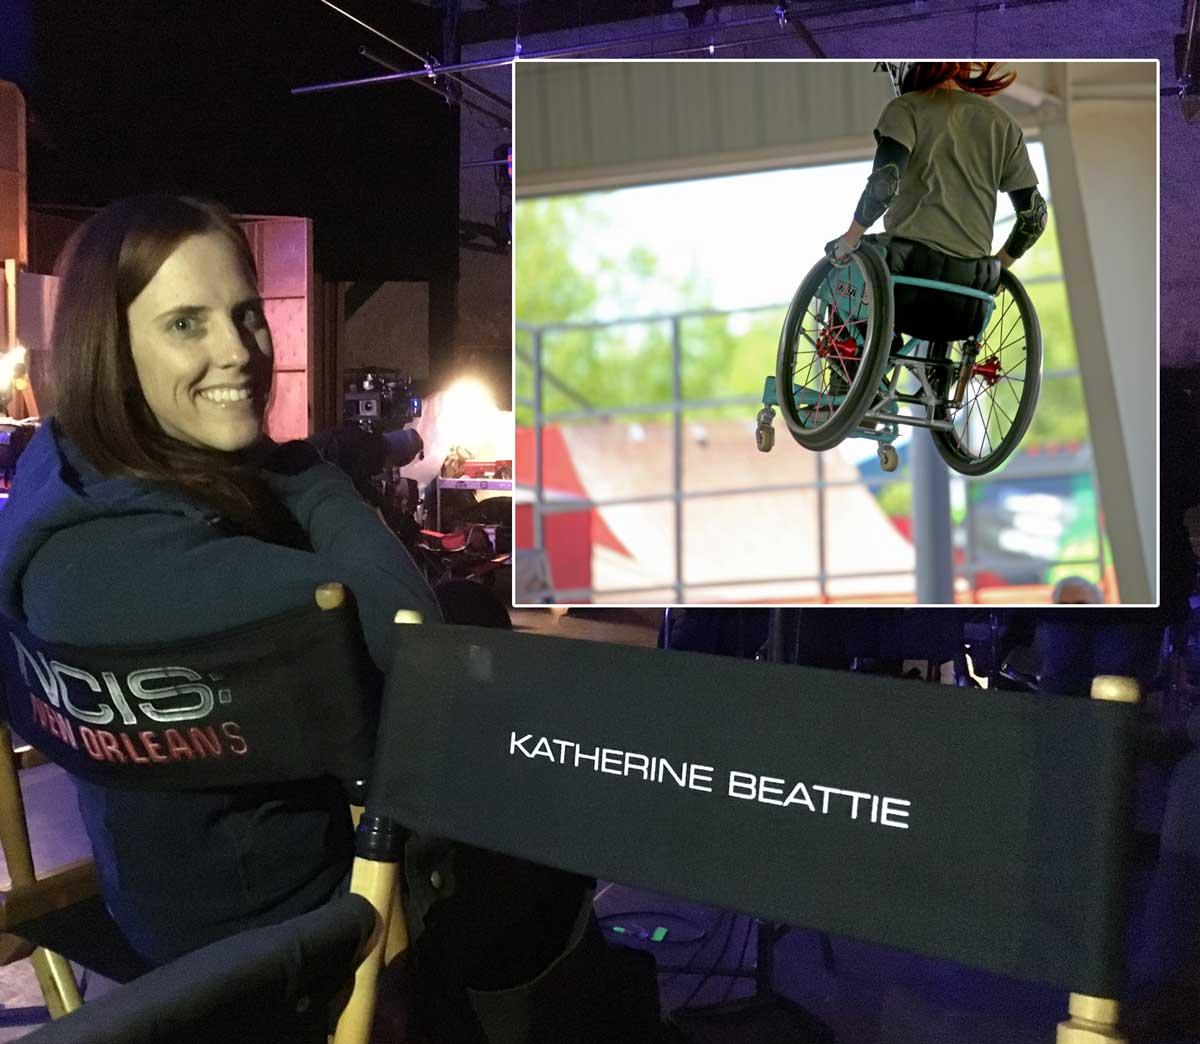 Katherine Beattie NCIS writer and wheelchair mx-er